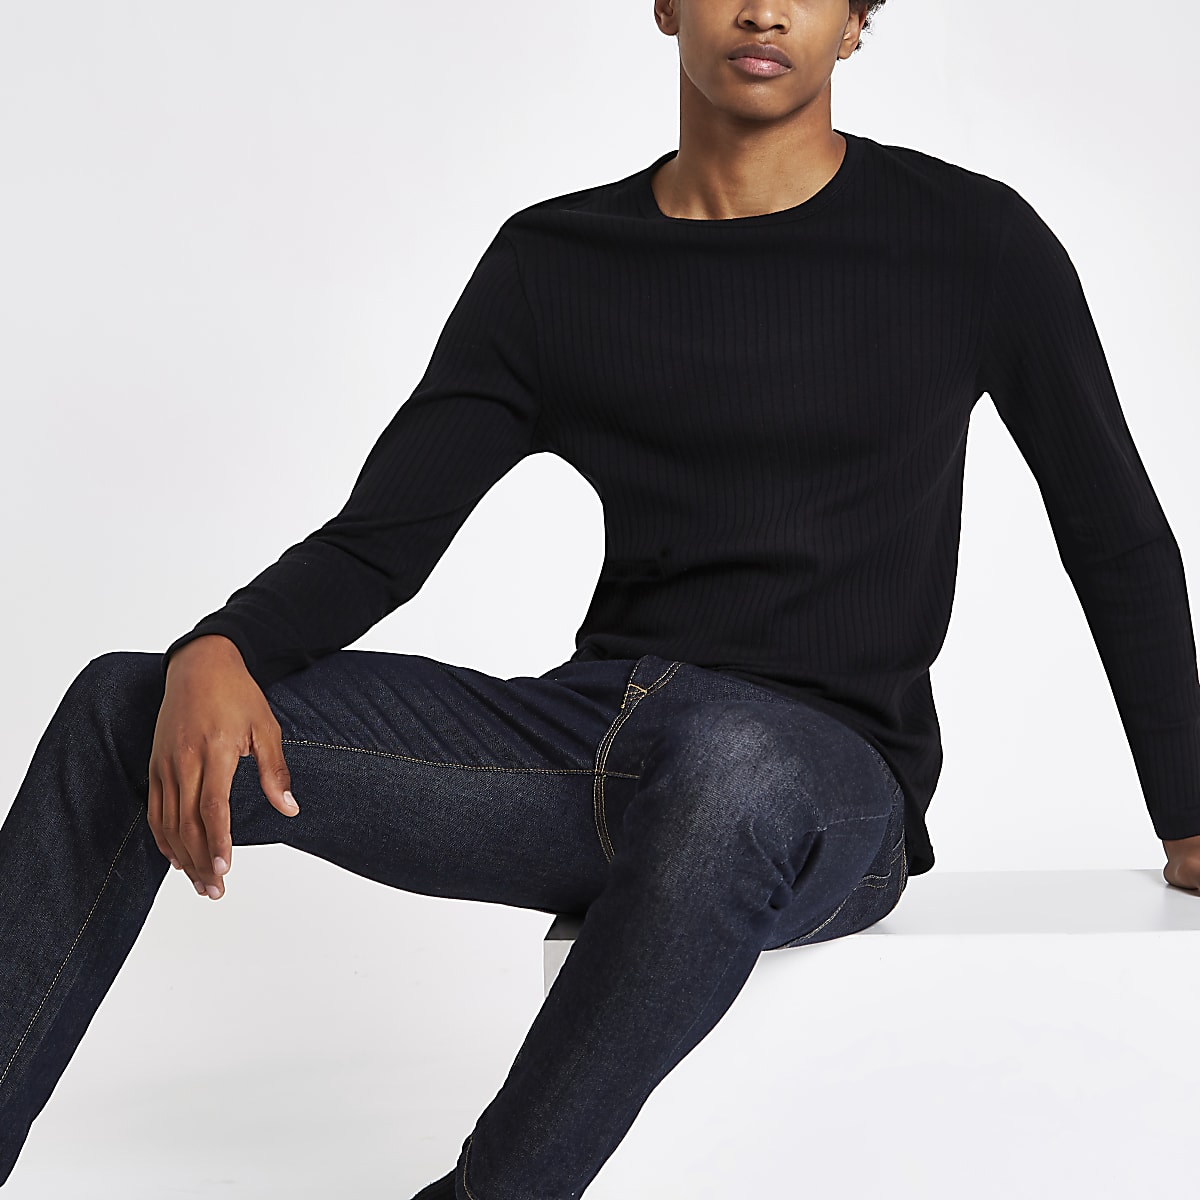 cb45df71f529fb Black ribbed slim fit long sleeve T-shirt - Long Sleeve T-Shirts - T-Shirts  & Vests - men